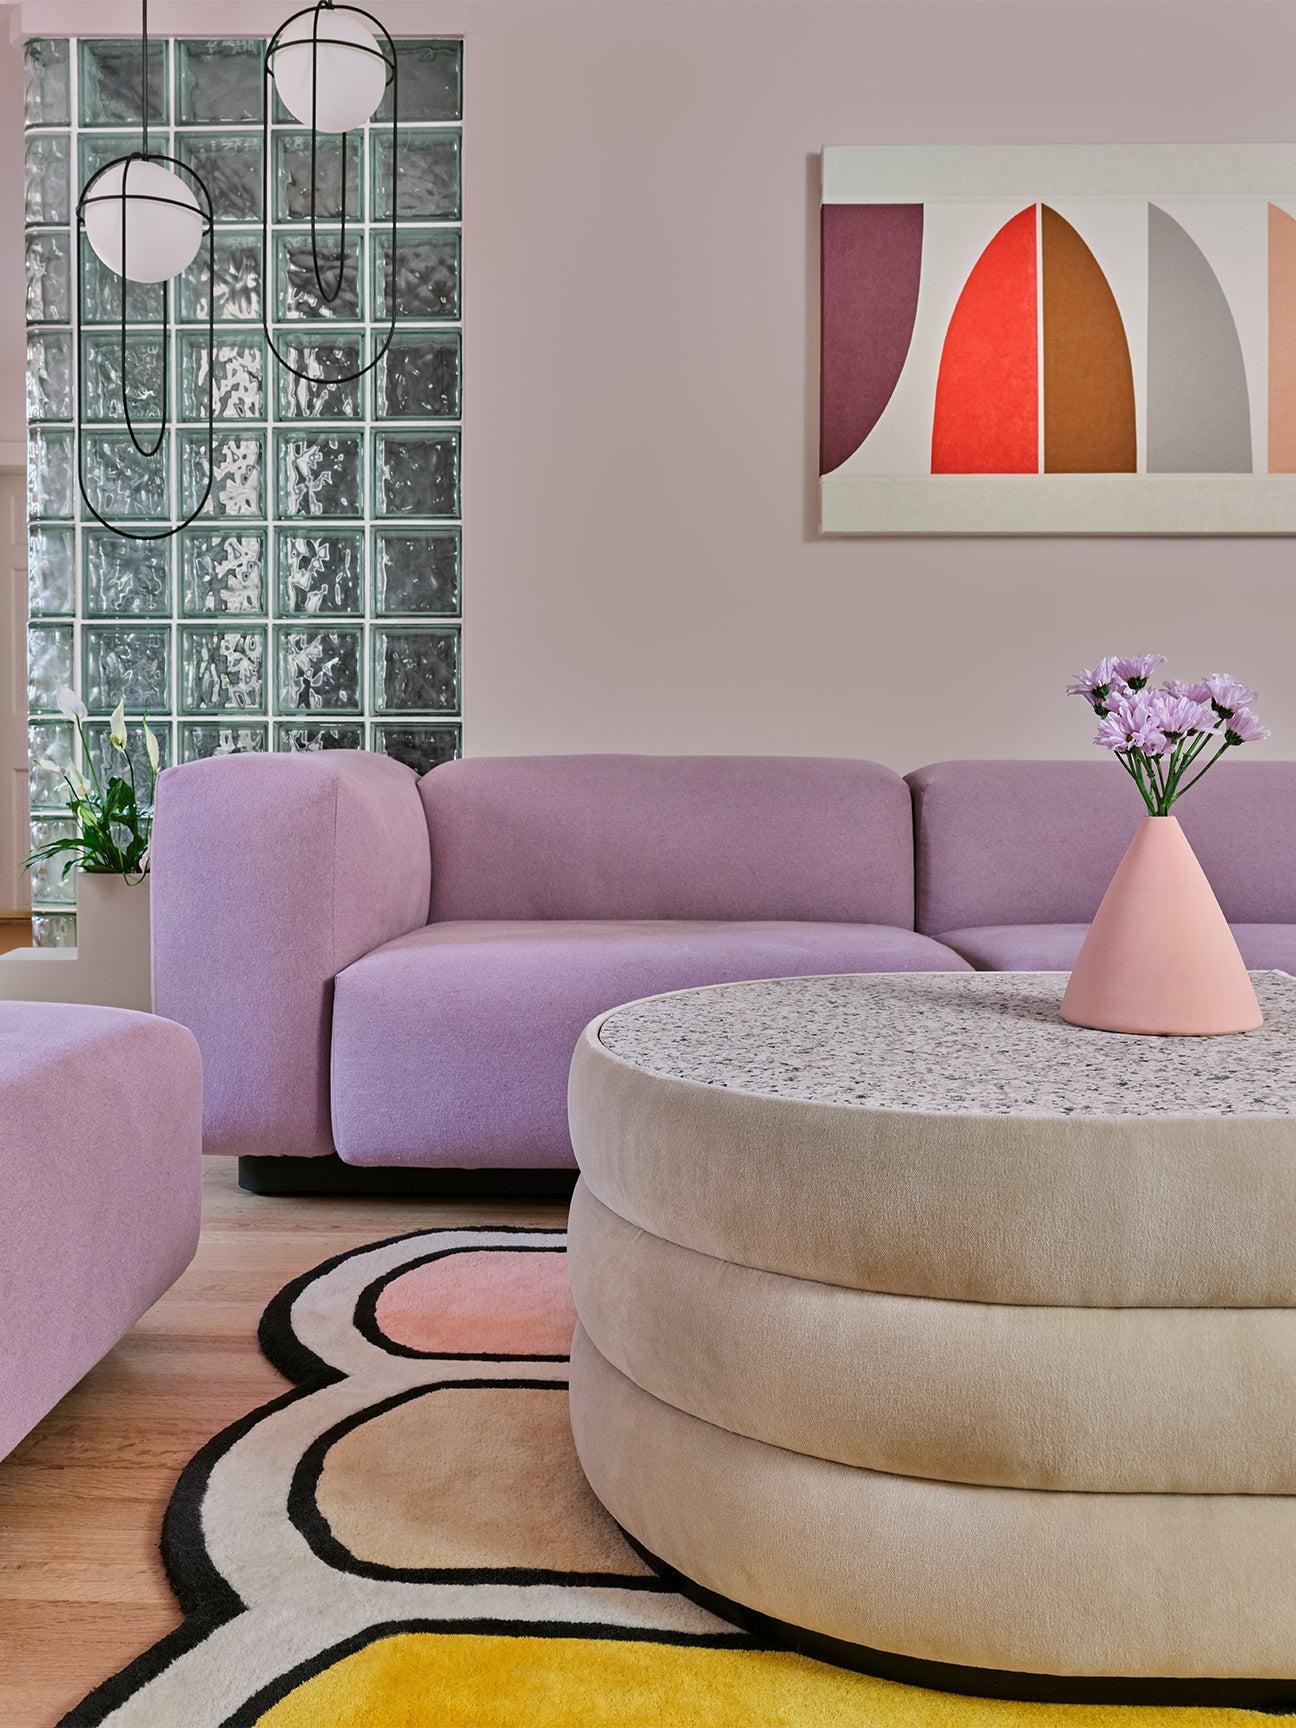 Lilac sofa and wavy rug